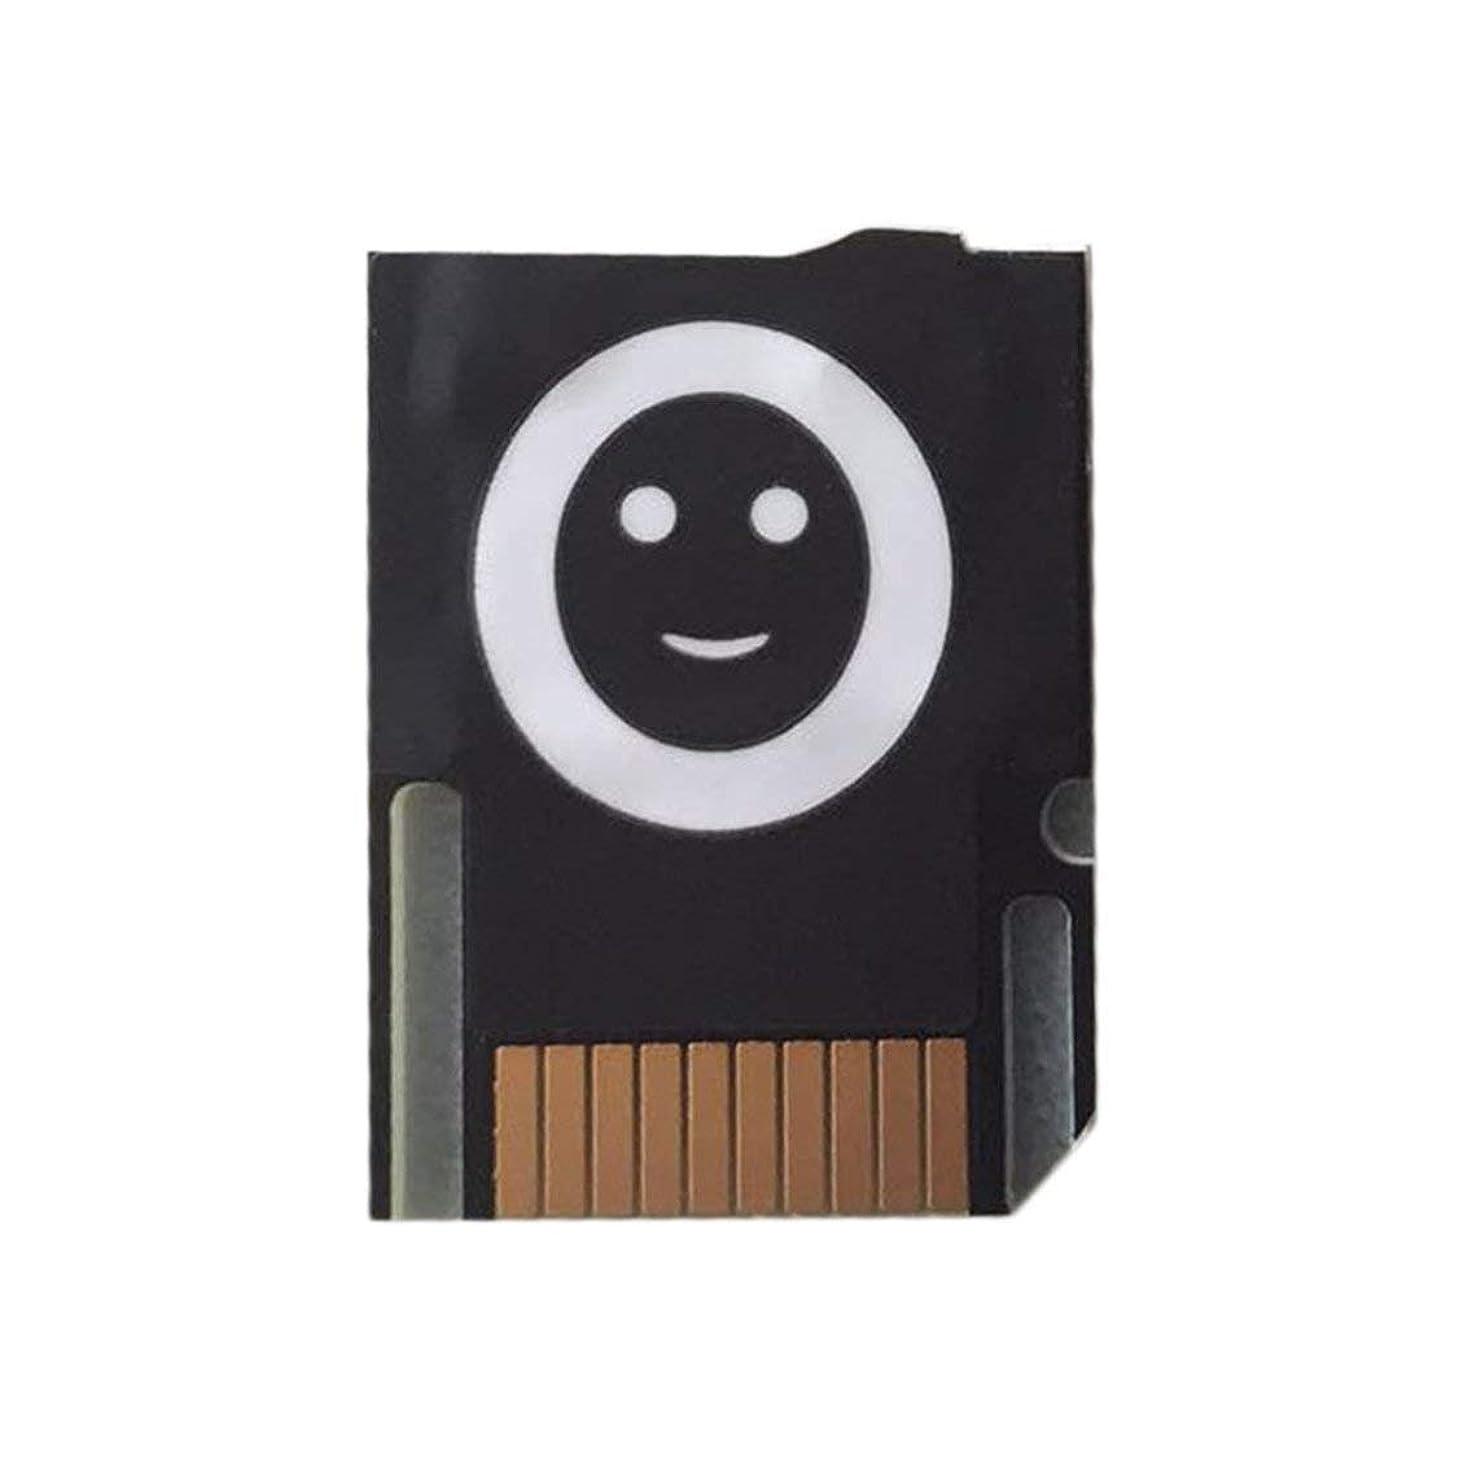 Small Mini Size Game Card to Micro Secure Digital Memory Card Adapter PSVITA SD2Vita Adapter Suitable for PS Vita 1000/2000 - Black